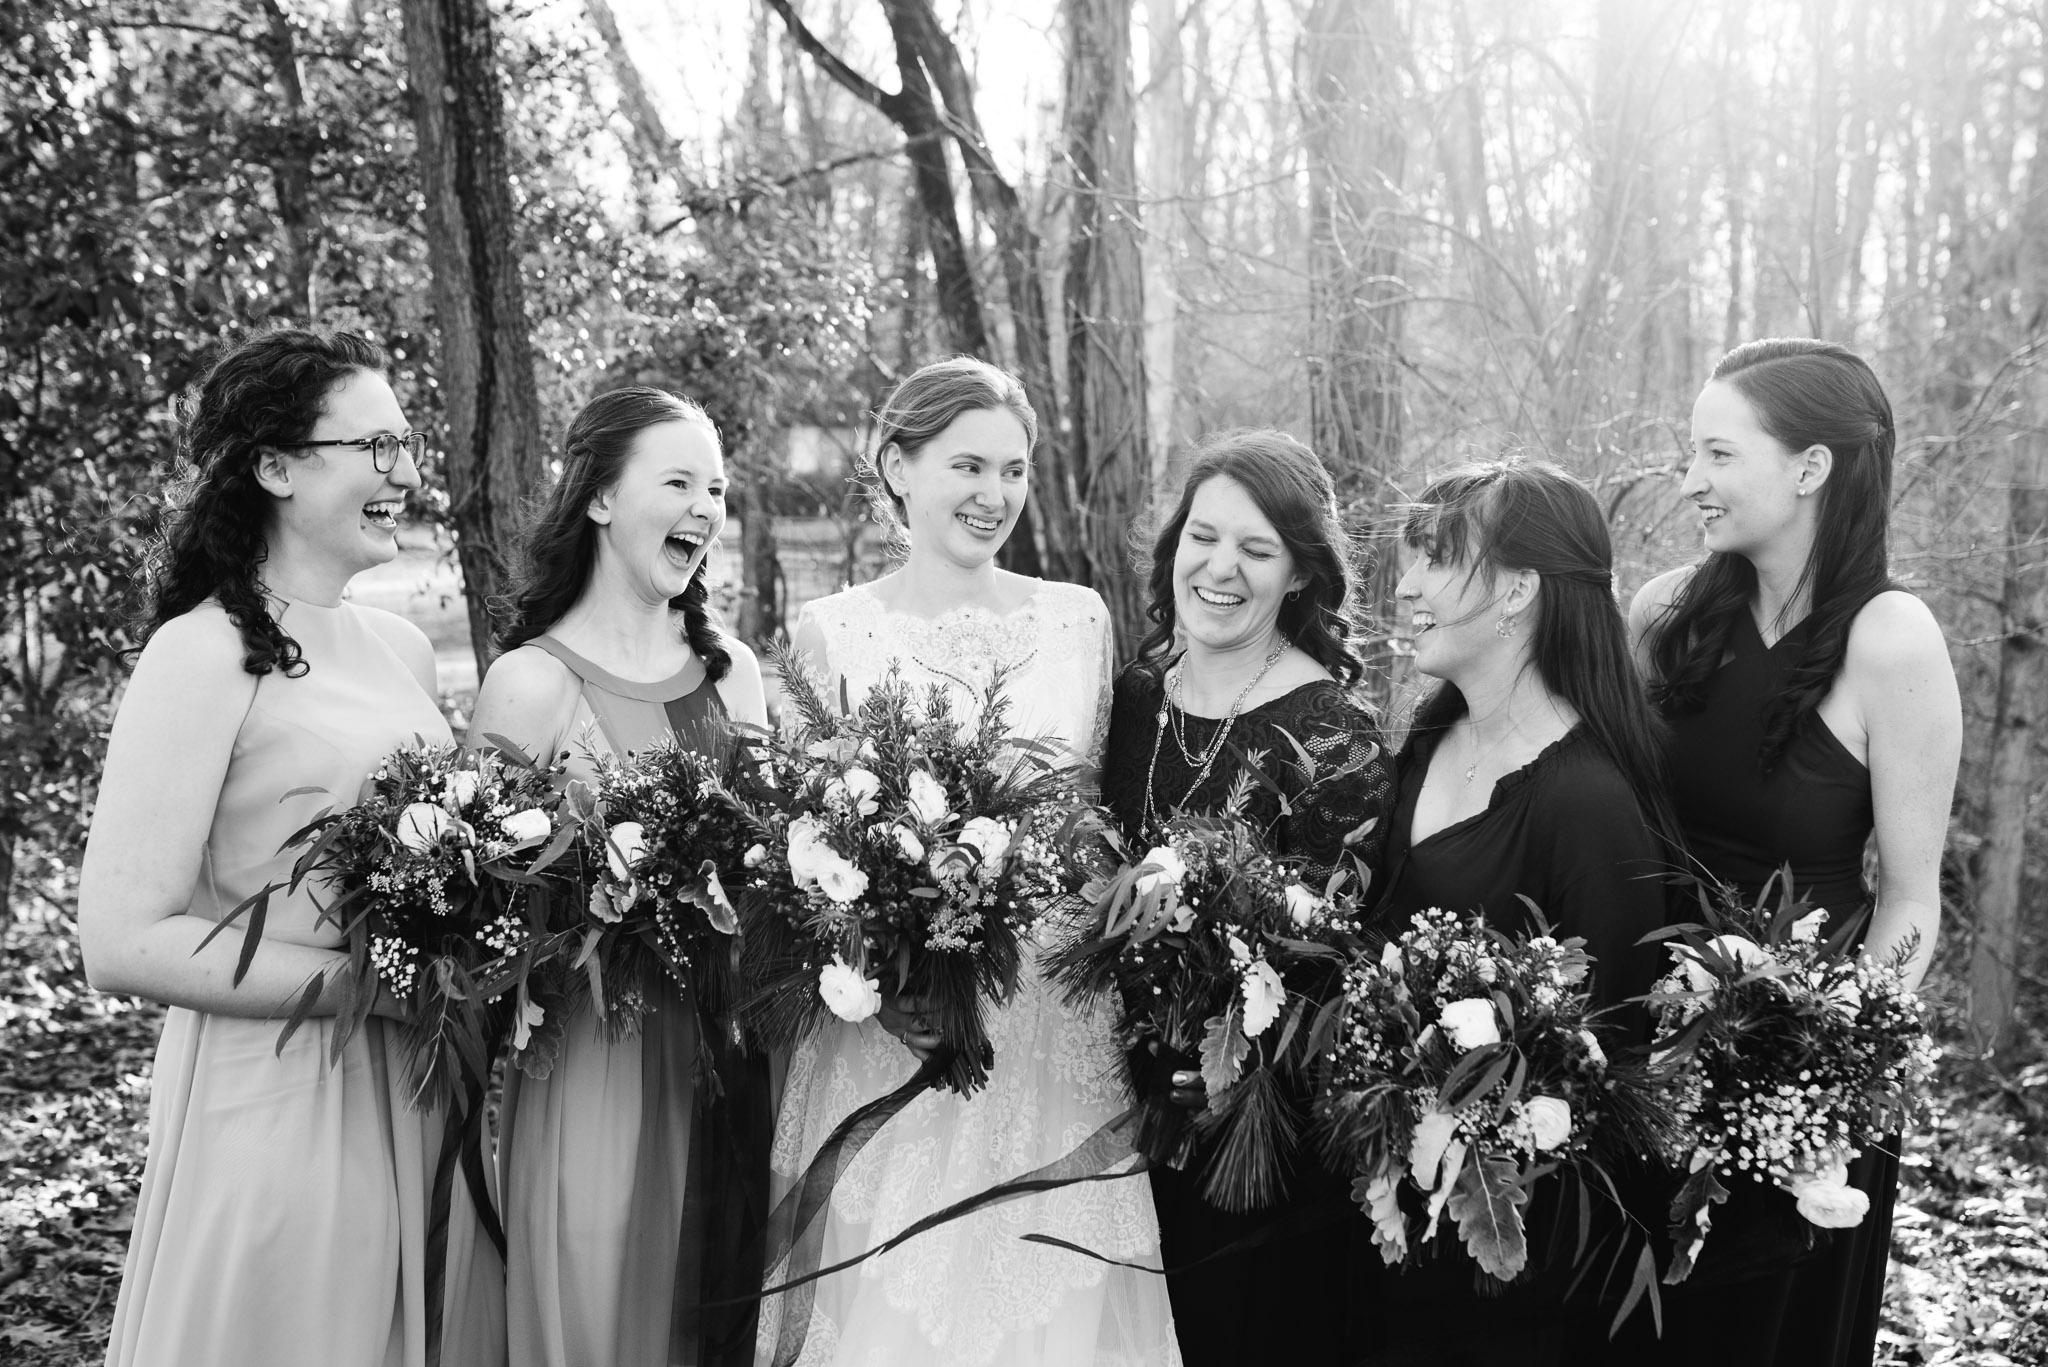 Ligonier Wedding Photographer, St Michaels Church, Ligonier PA -6648.jpg